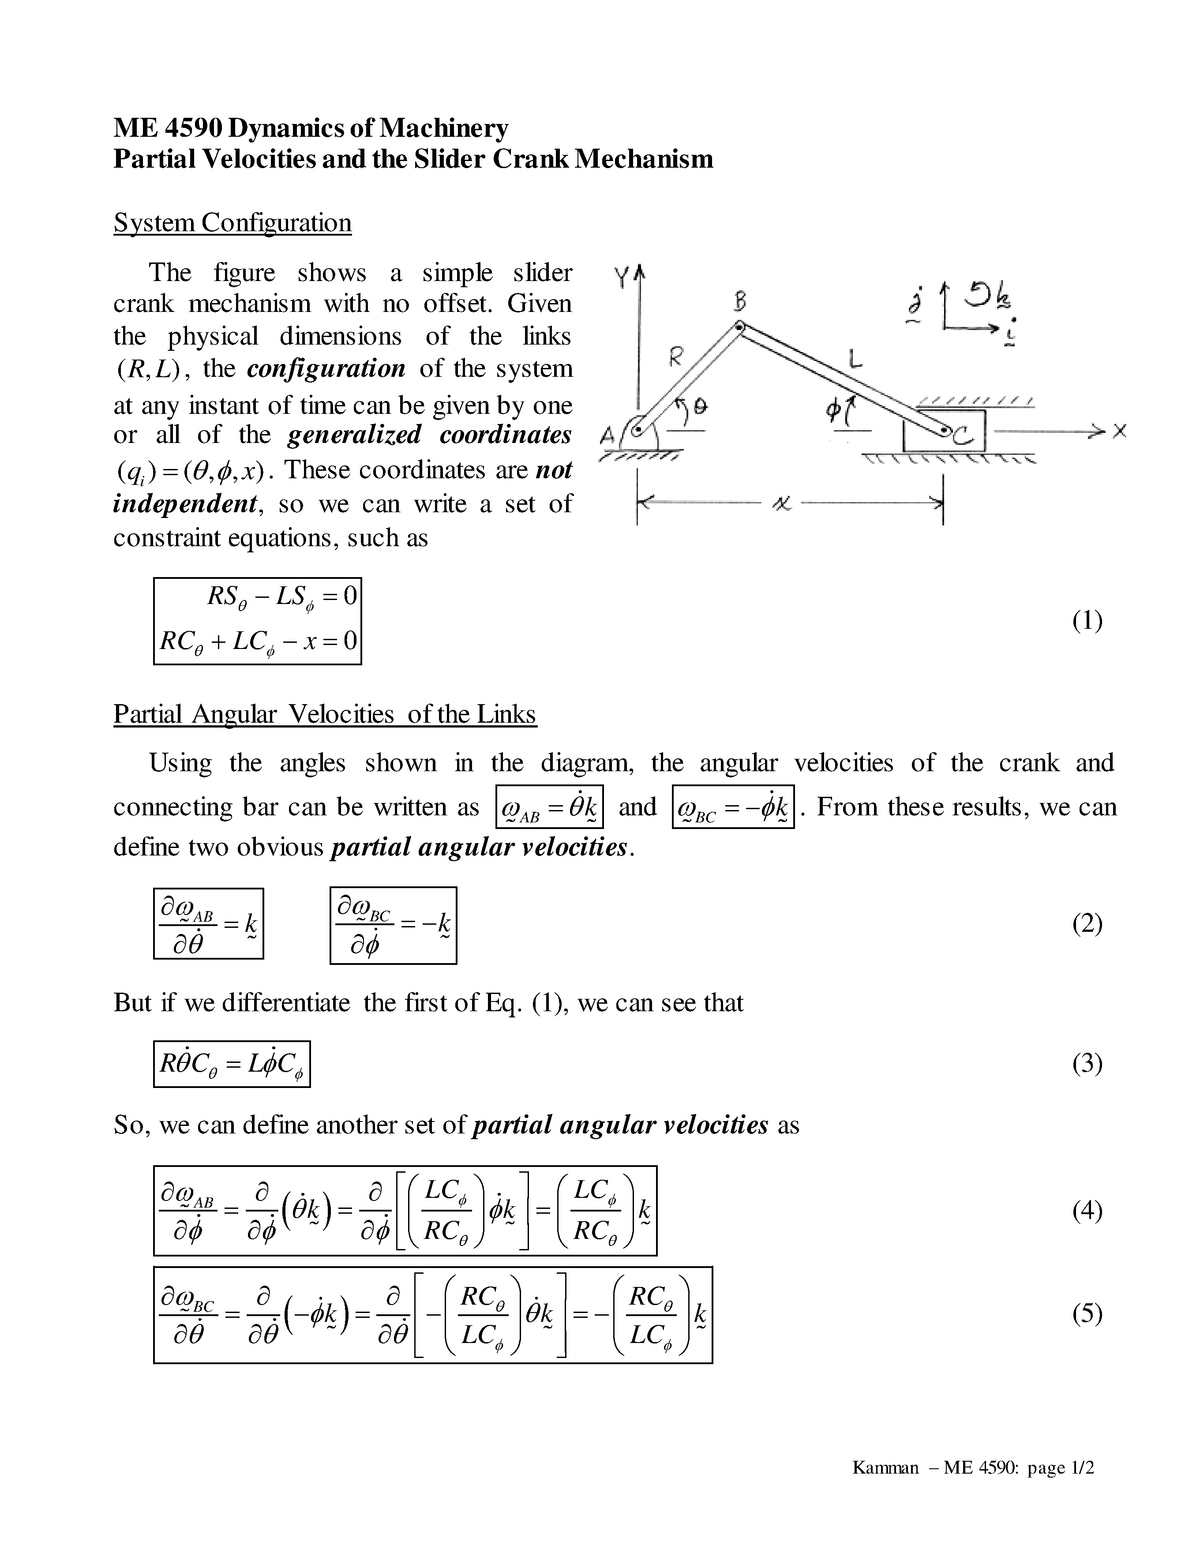 ME459Partial Velocities Slider Crank - ME 4590: Dynamics Of